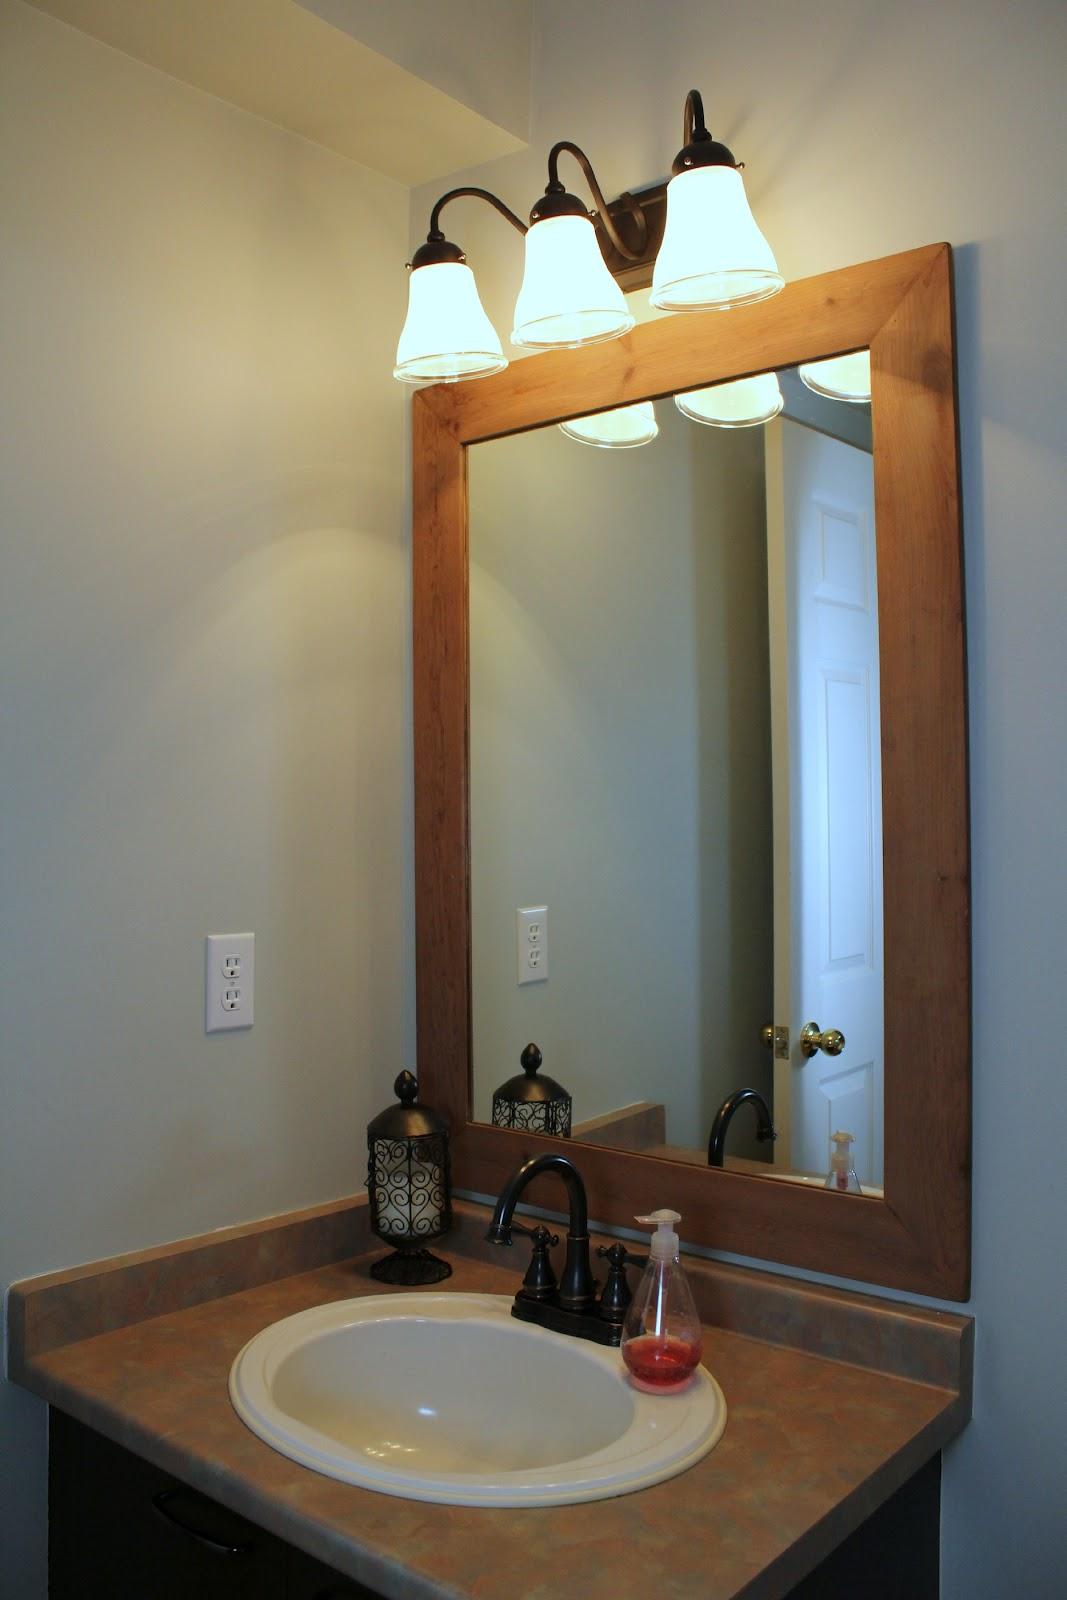 Turtles And Tails Main Floor Bathroom Final Installment